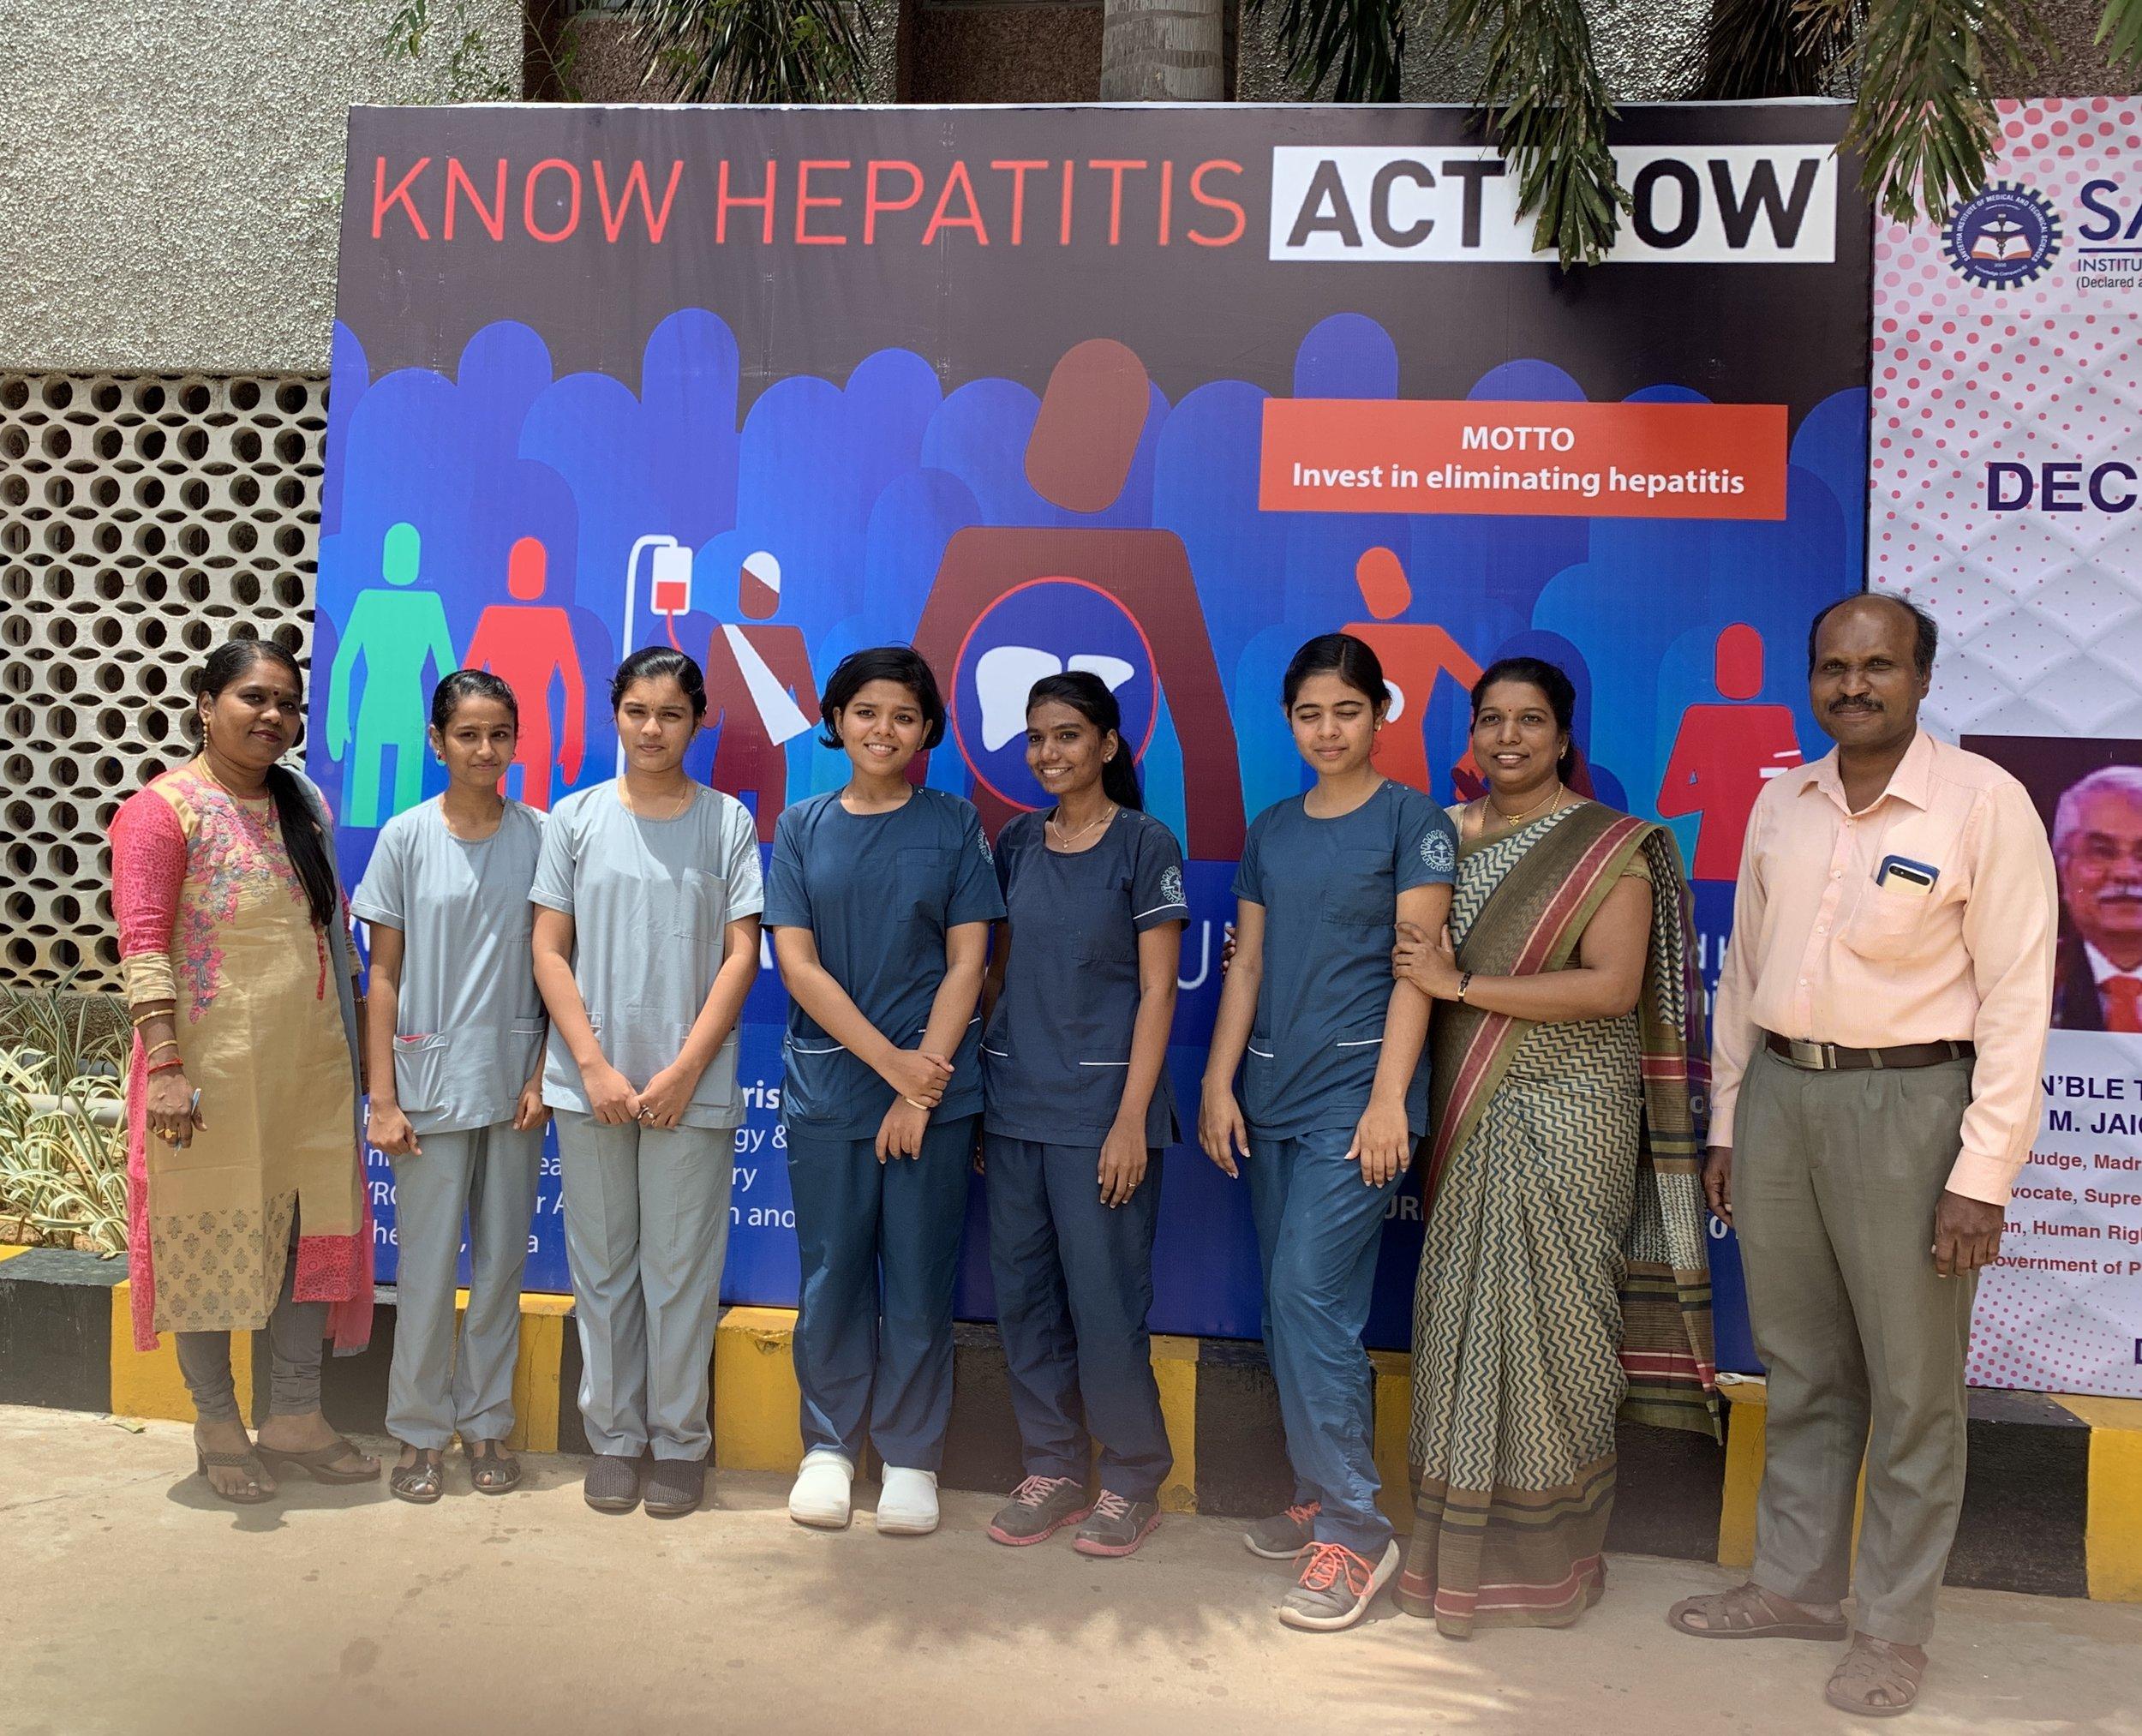 micro hepatitis day.jpg